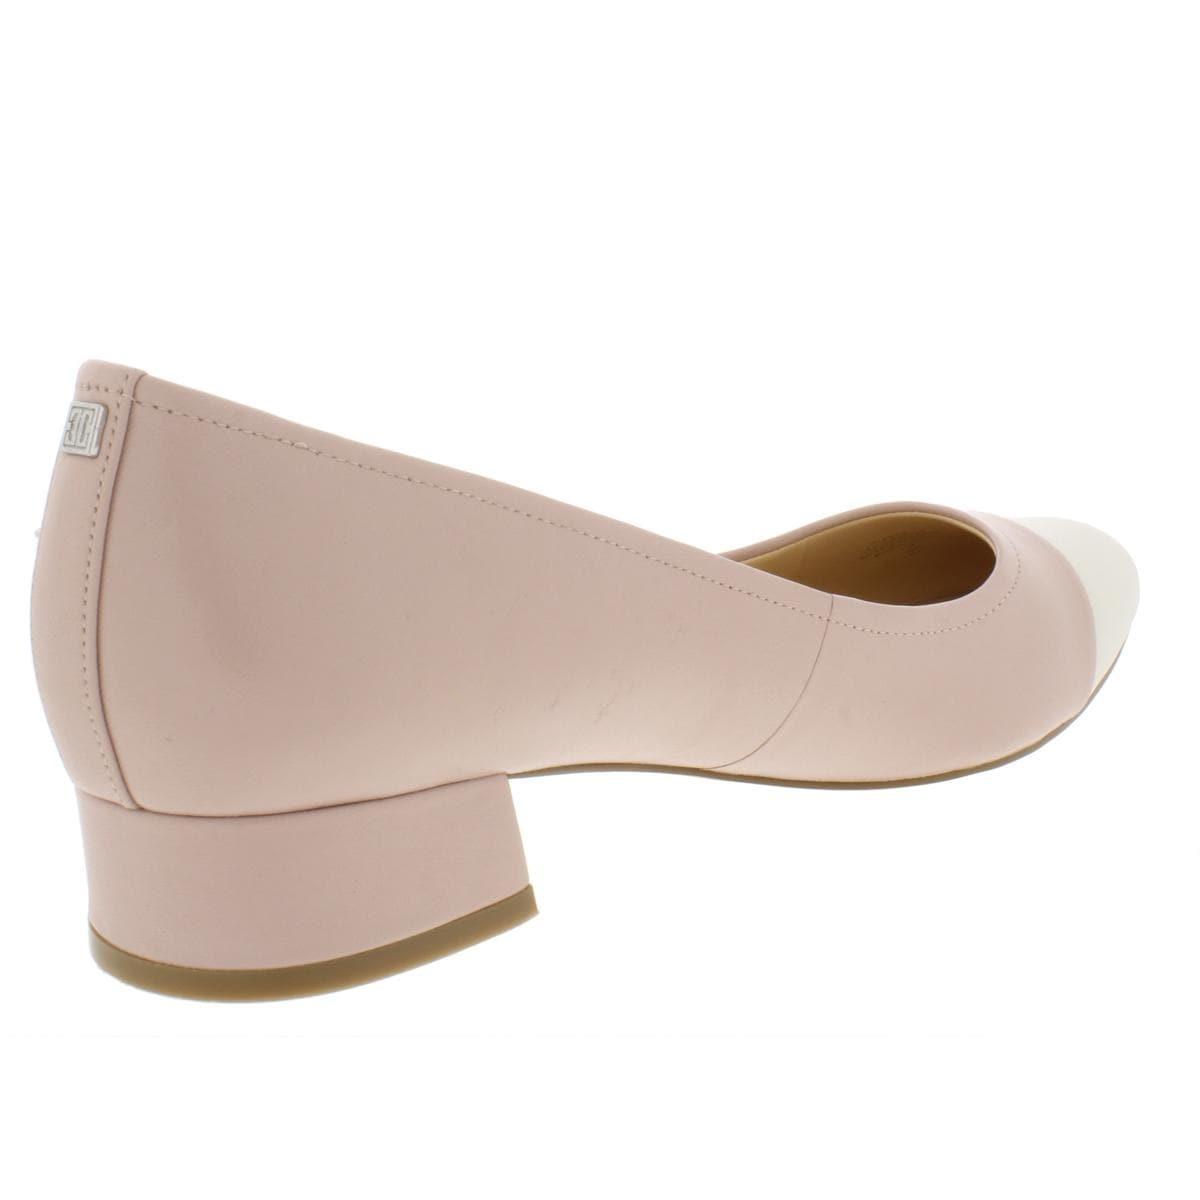 69077ea8c99 Shop Ivanka Trump Womens Larrie Pumps Kitten Heels - Free Shipping On  Orders Over  45 - Overstock - 27584948